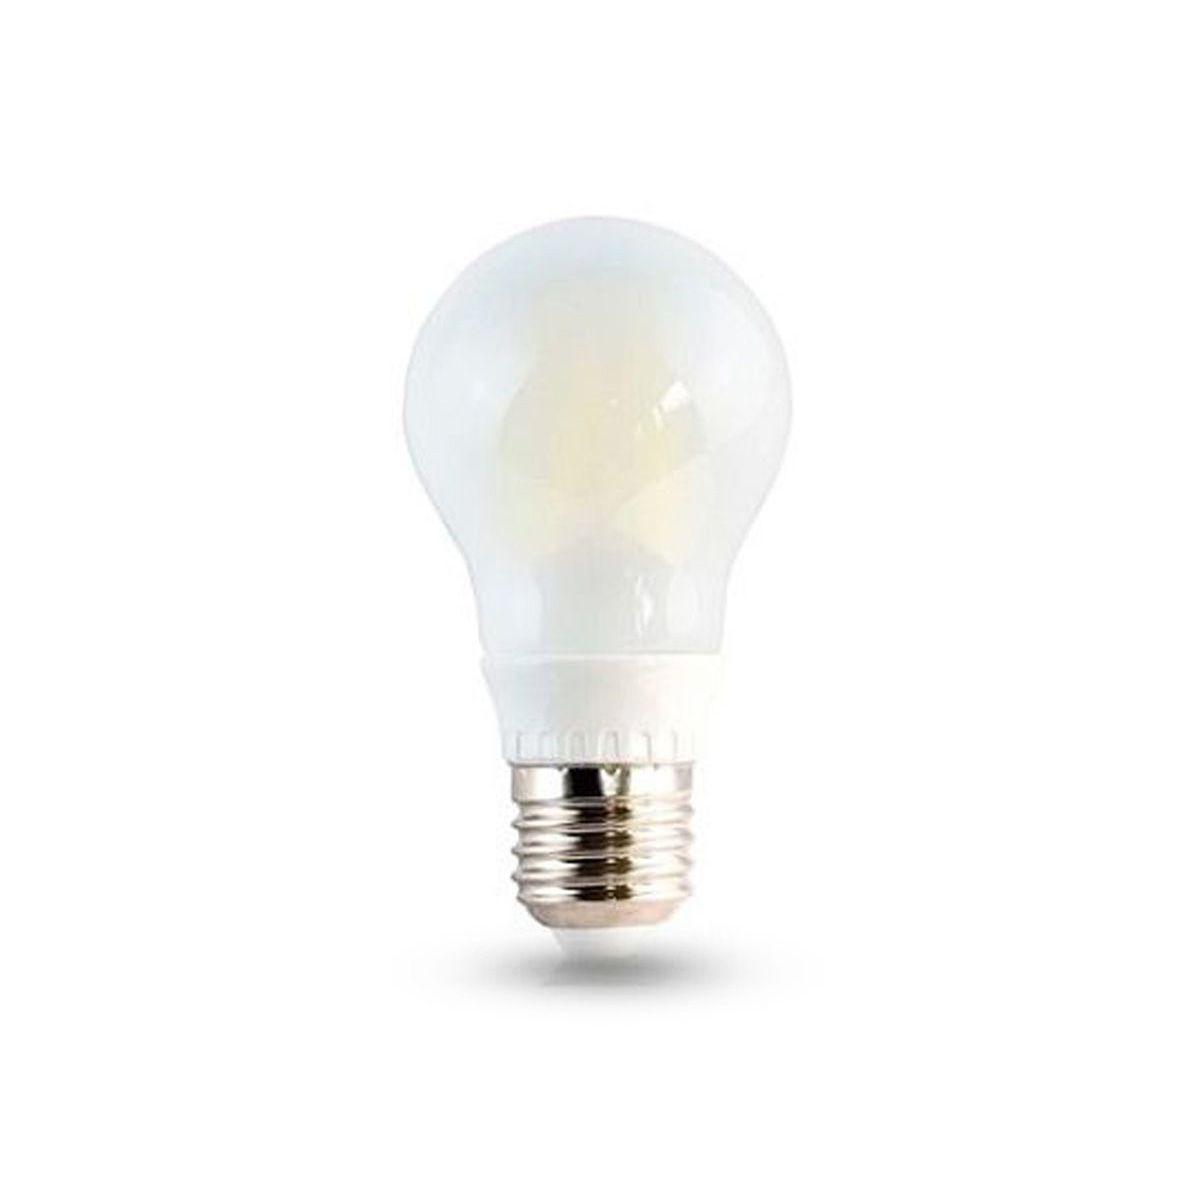 Lâmpada LED Filamento FOSCO  A60 E27 6W 2700K Bivolt